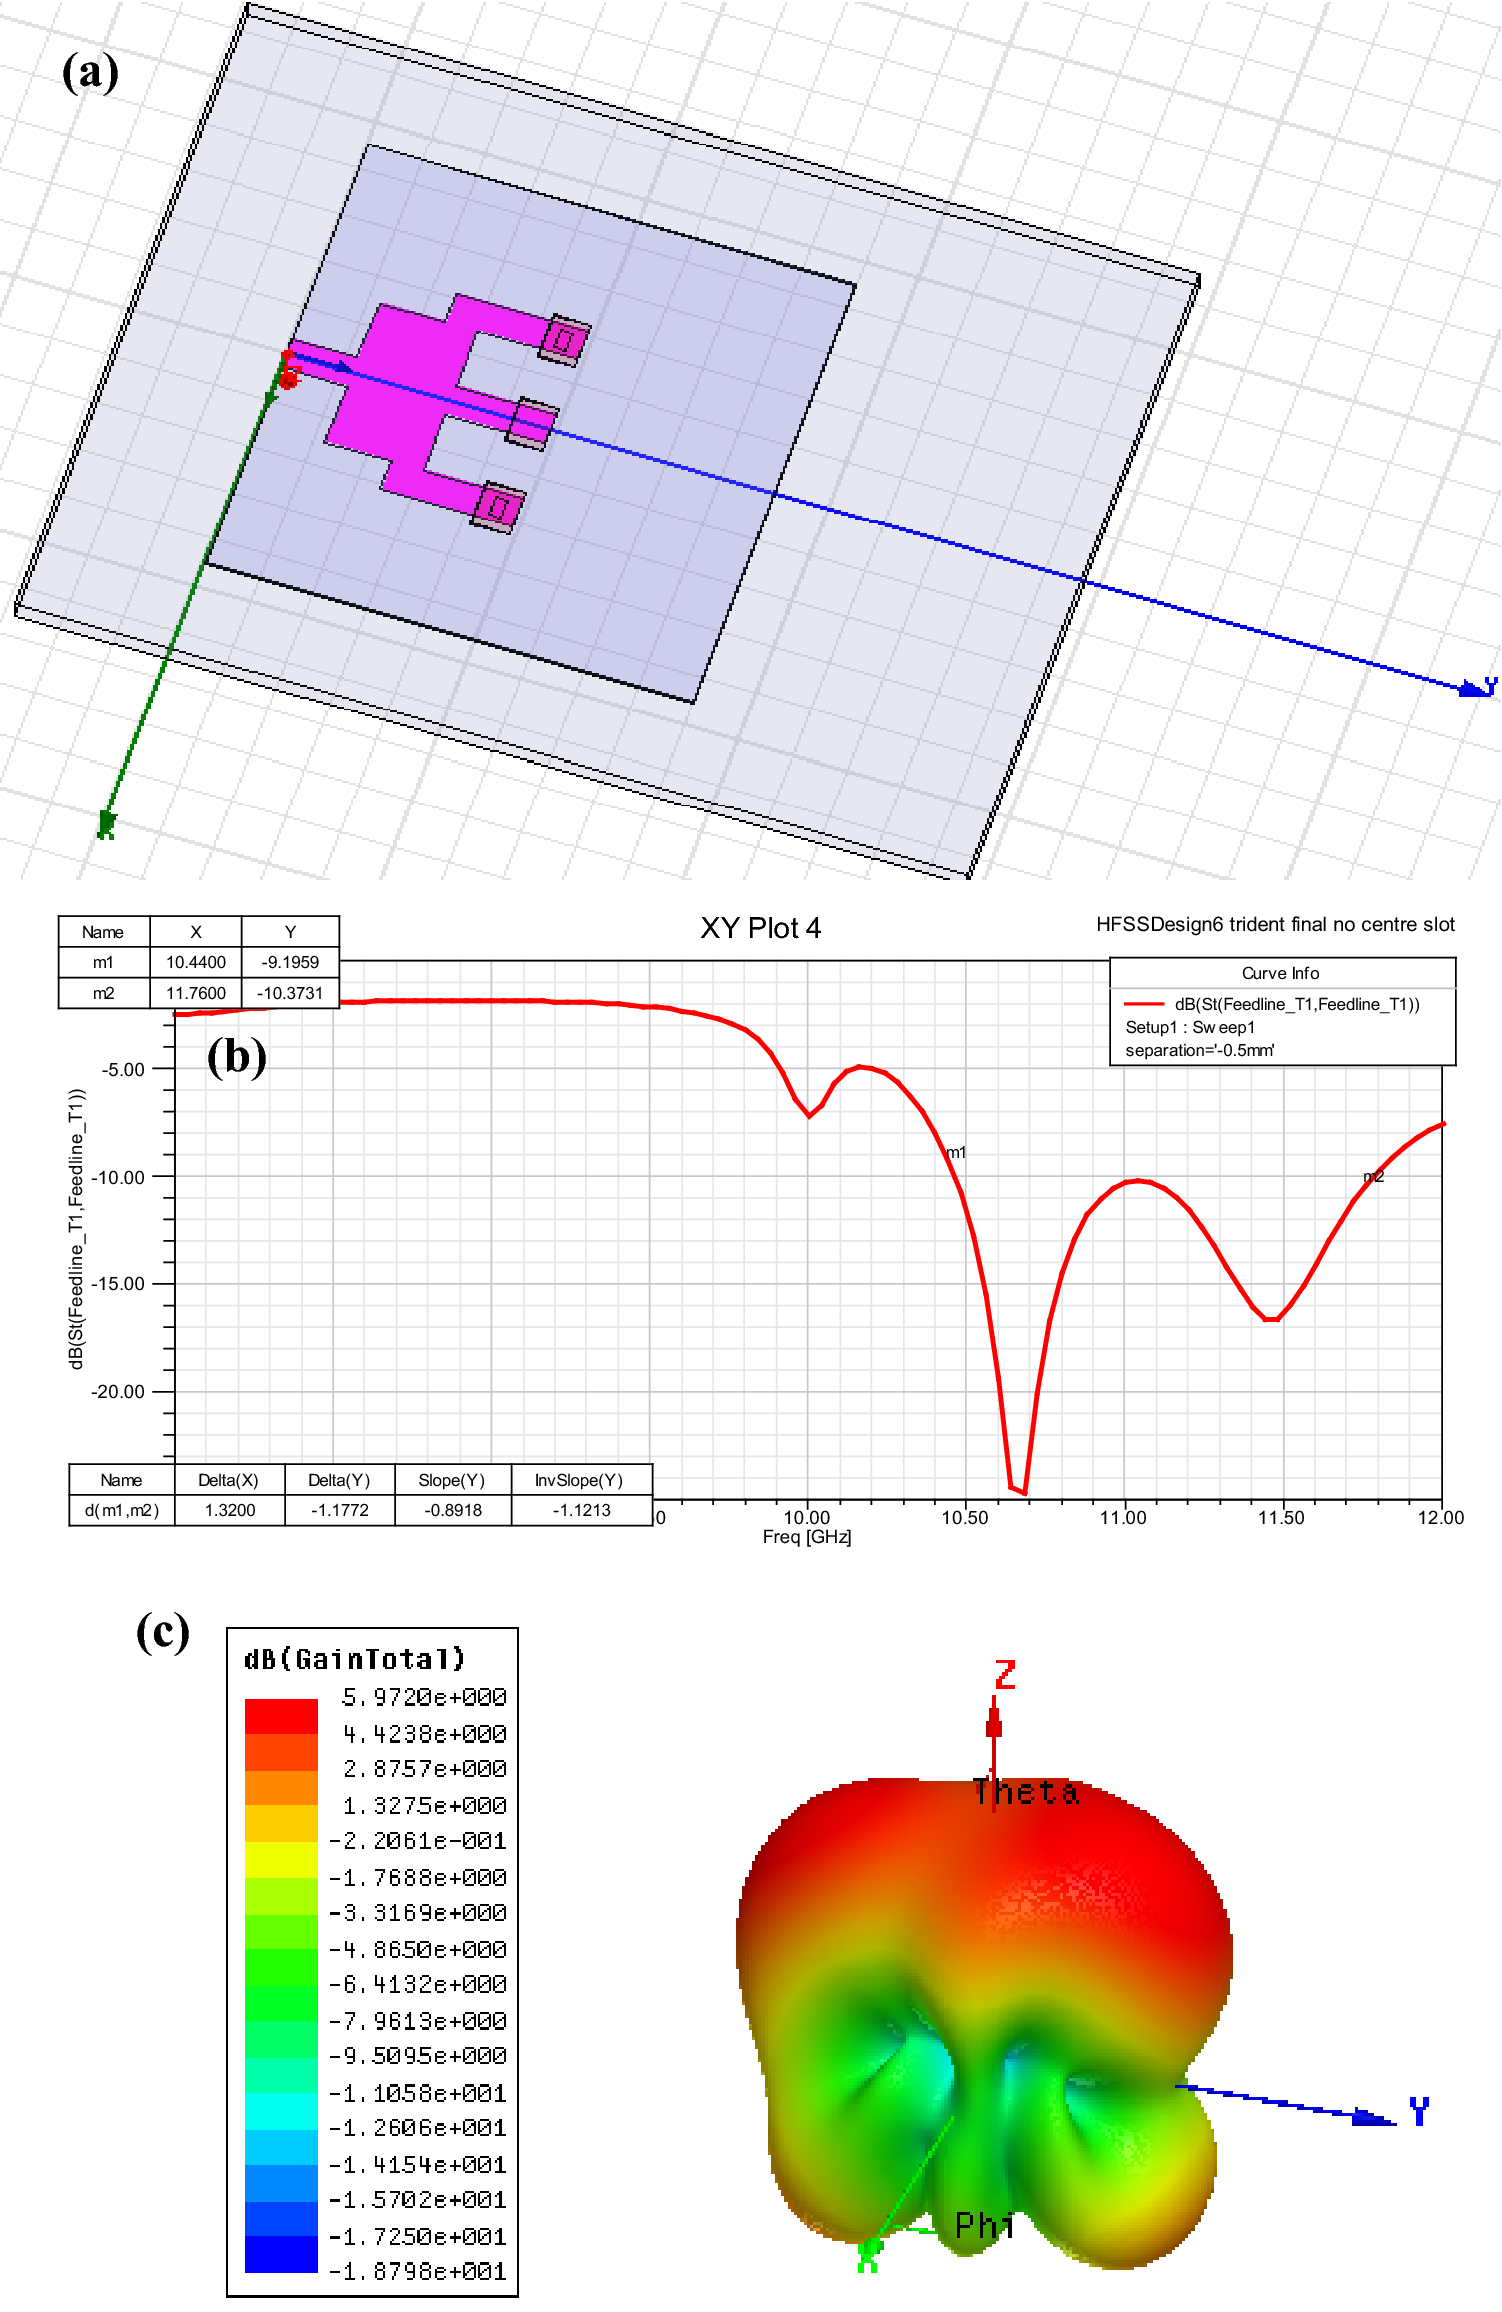 Design and Development of Dielectric Resonator Antenna Using Ceramic